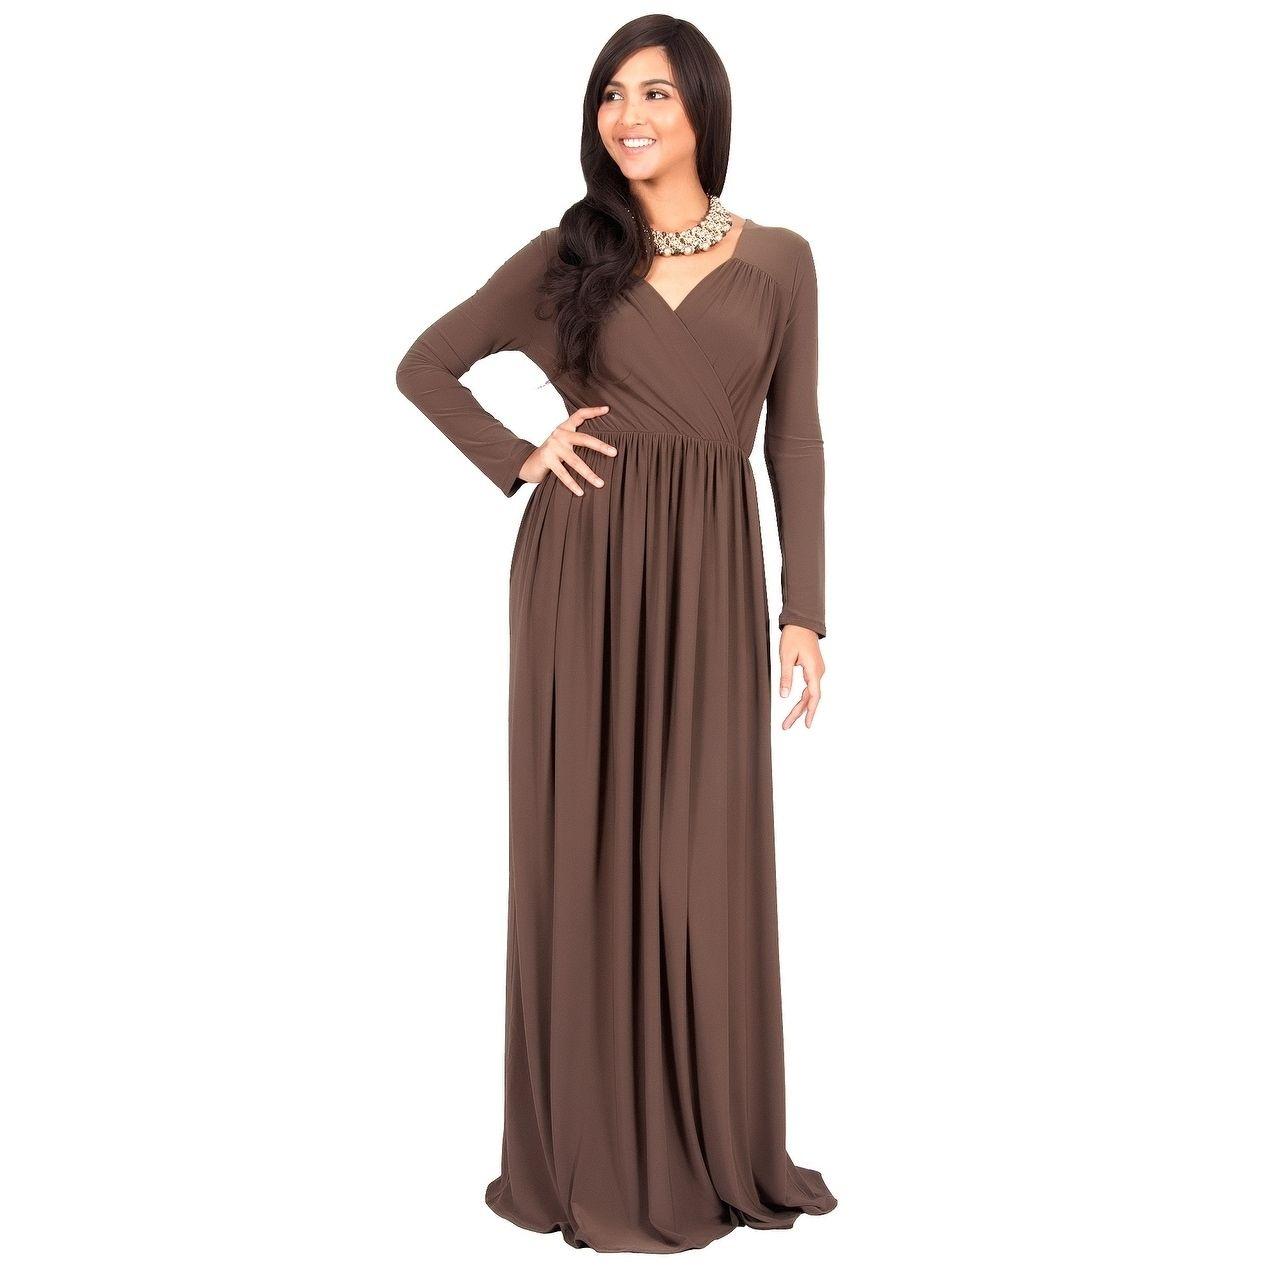 Koh koh womenus long sleeve empire waist dress white m global